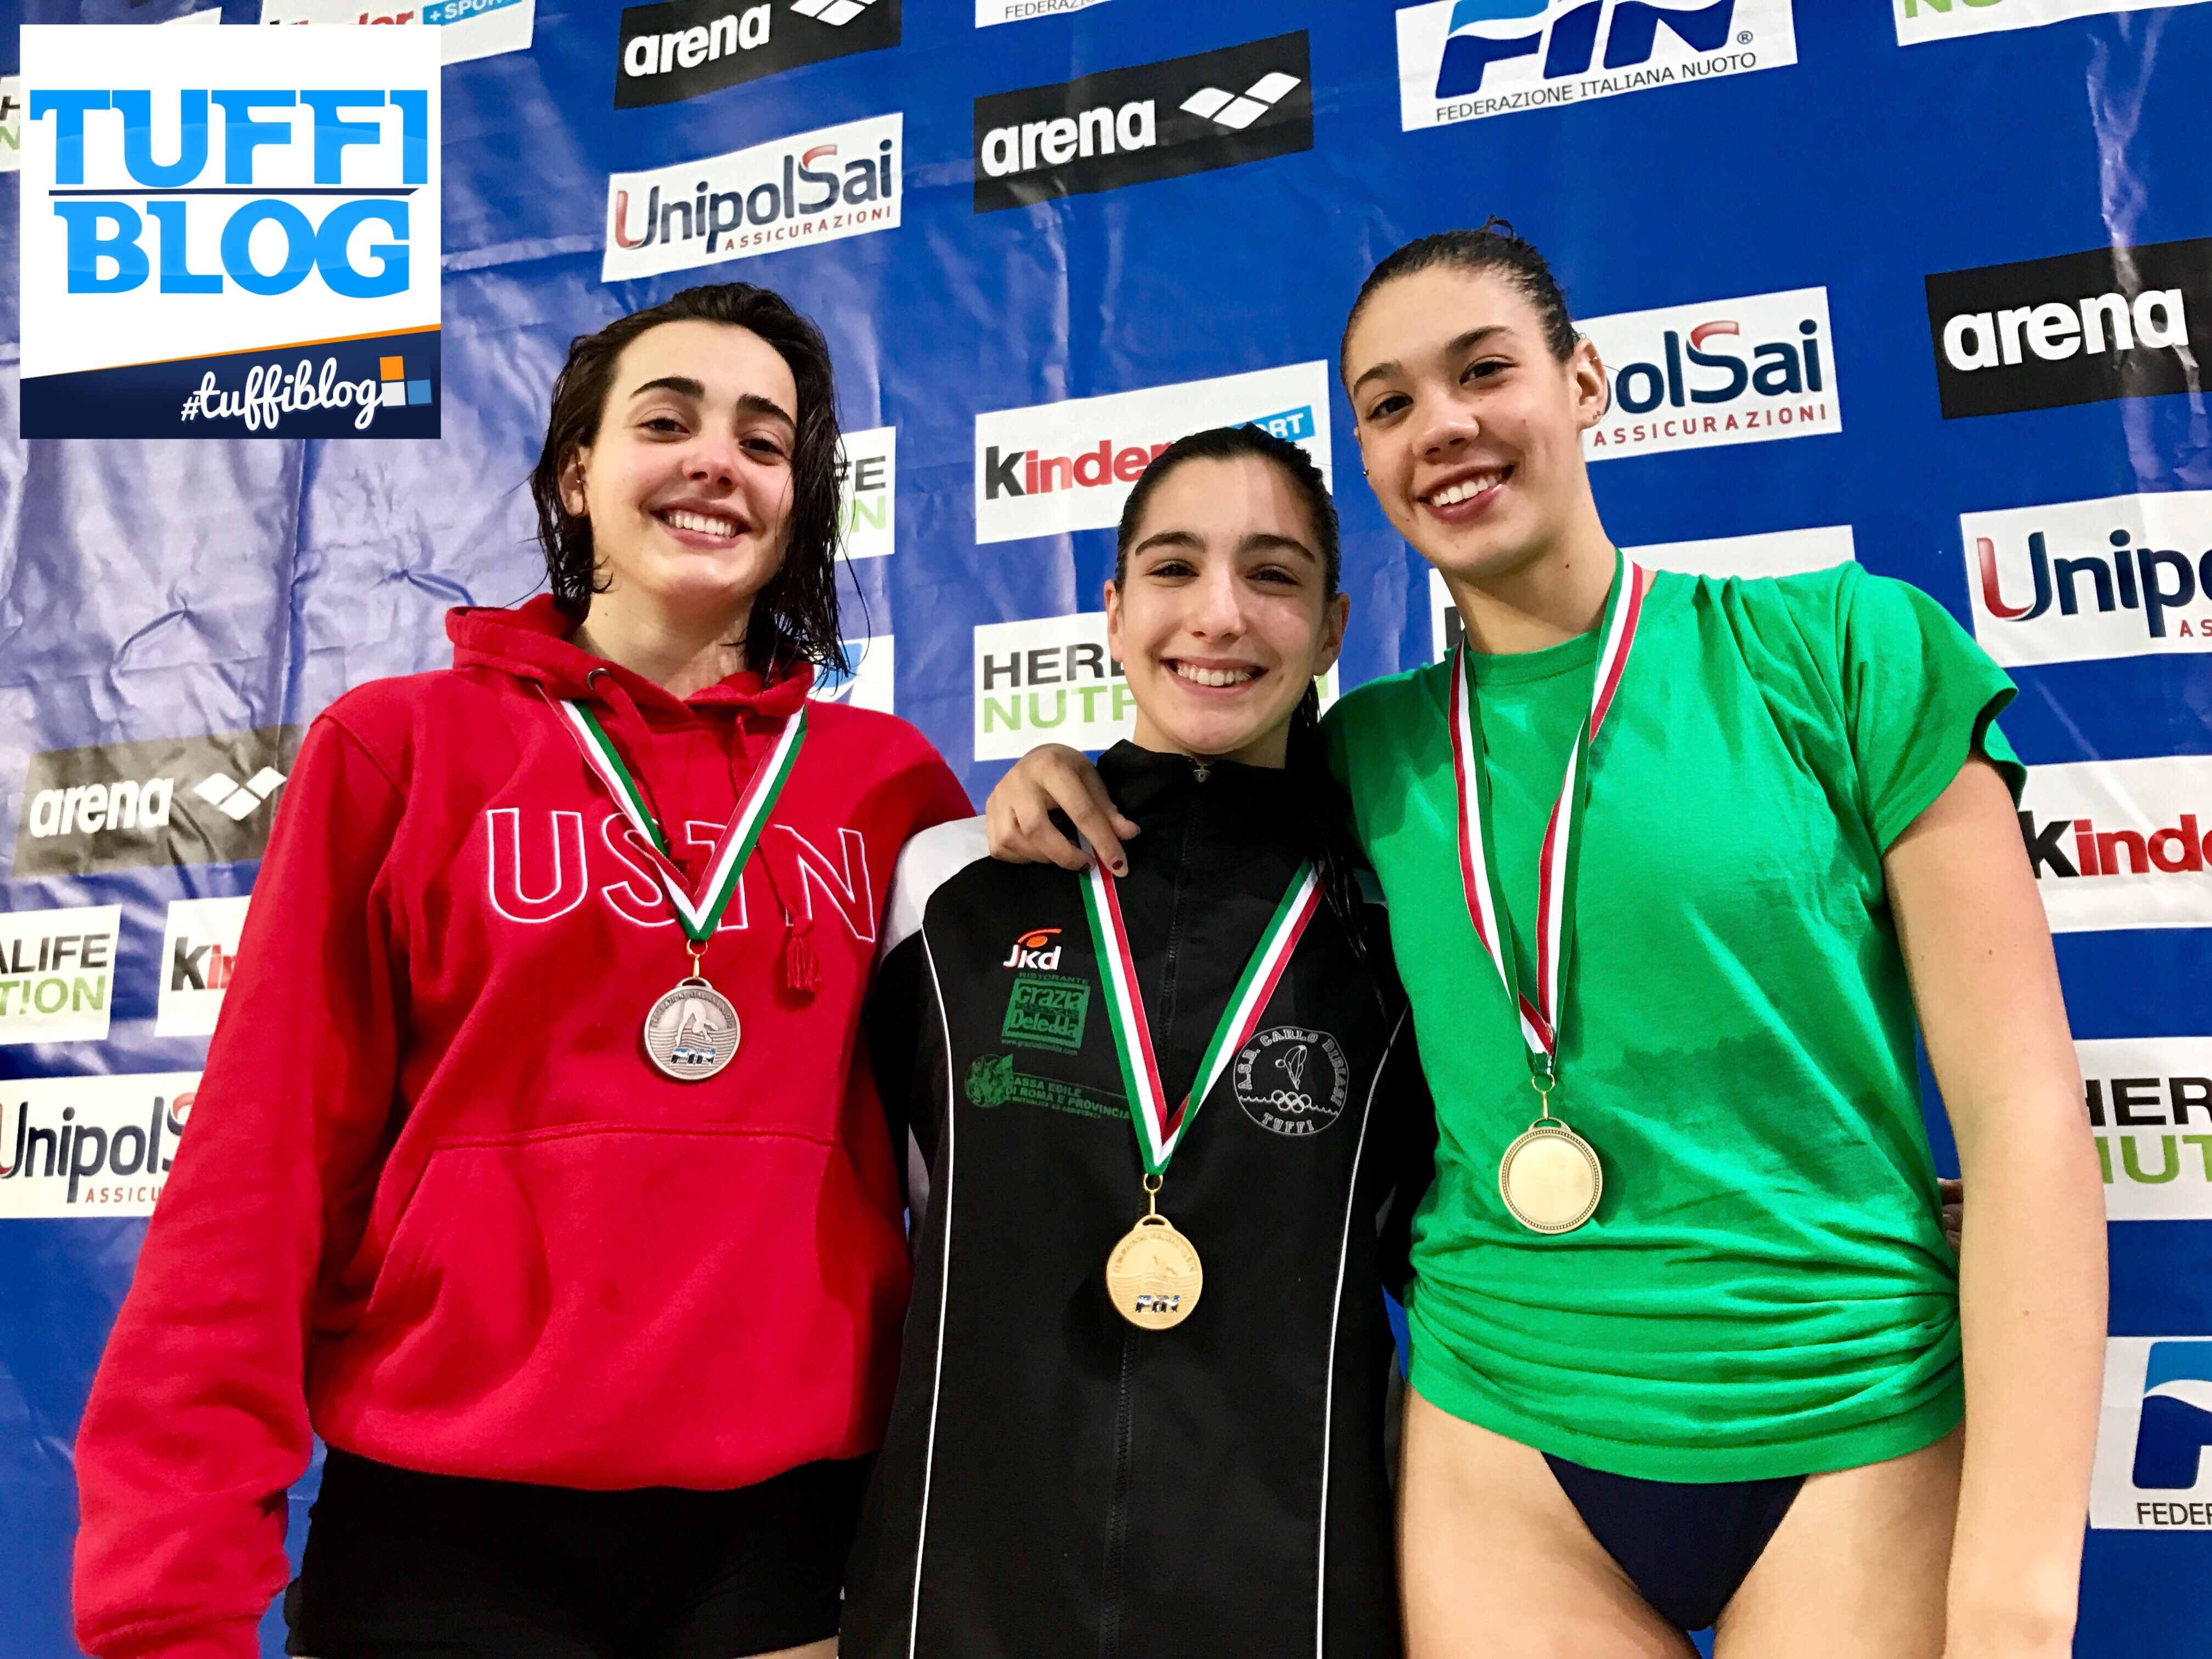 Campionati di Categoria indoor: Trieste - La conclusione!